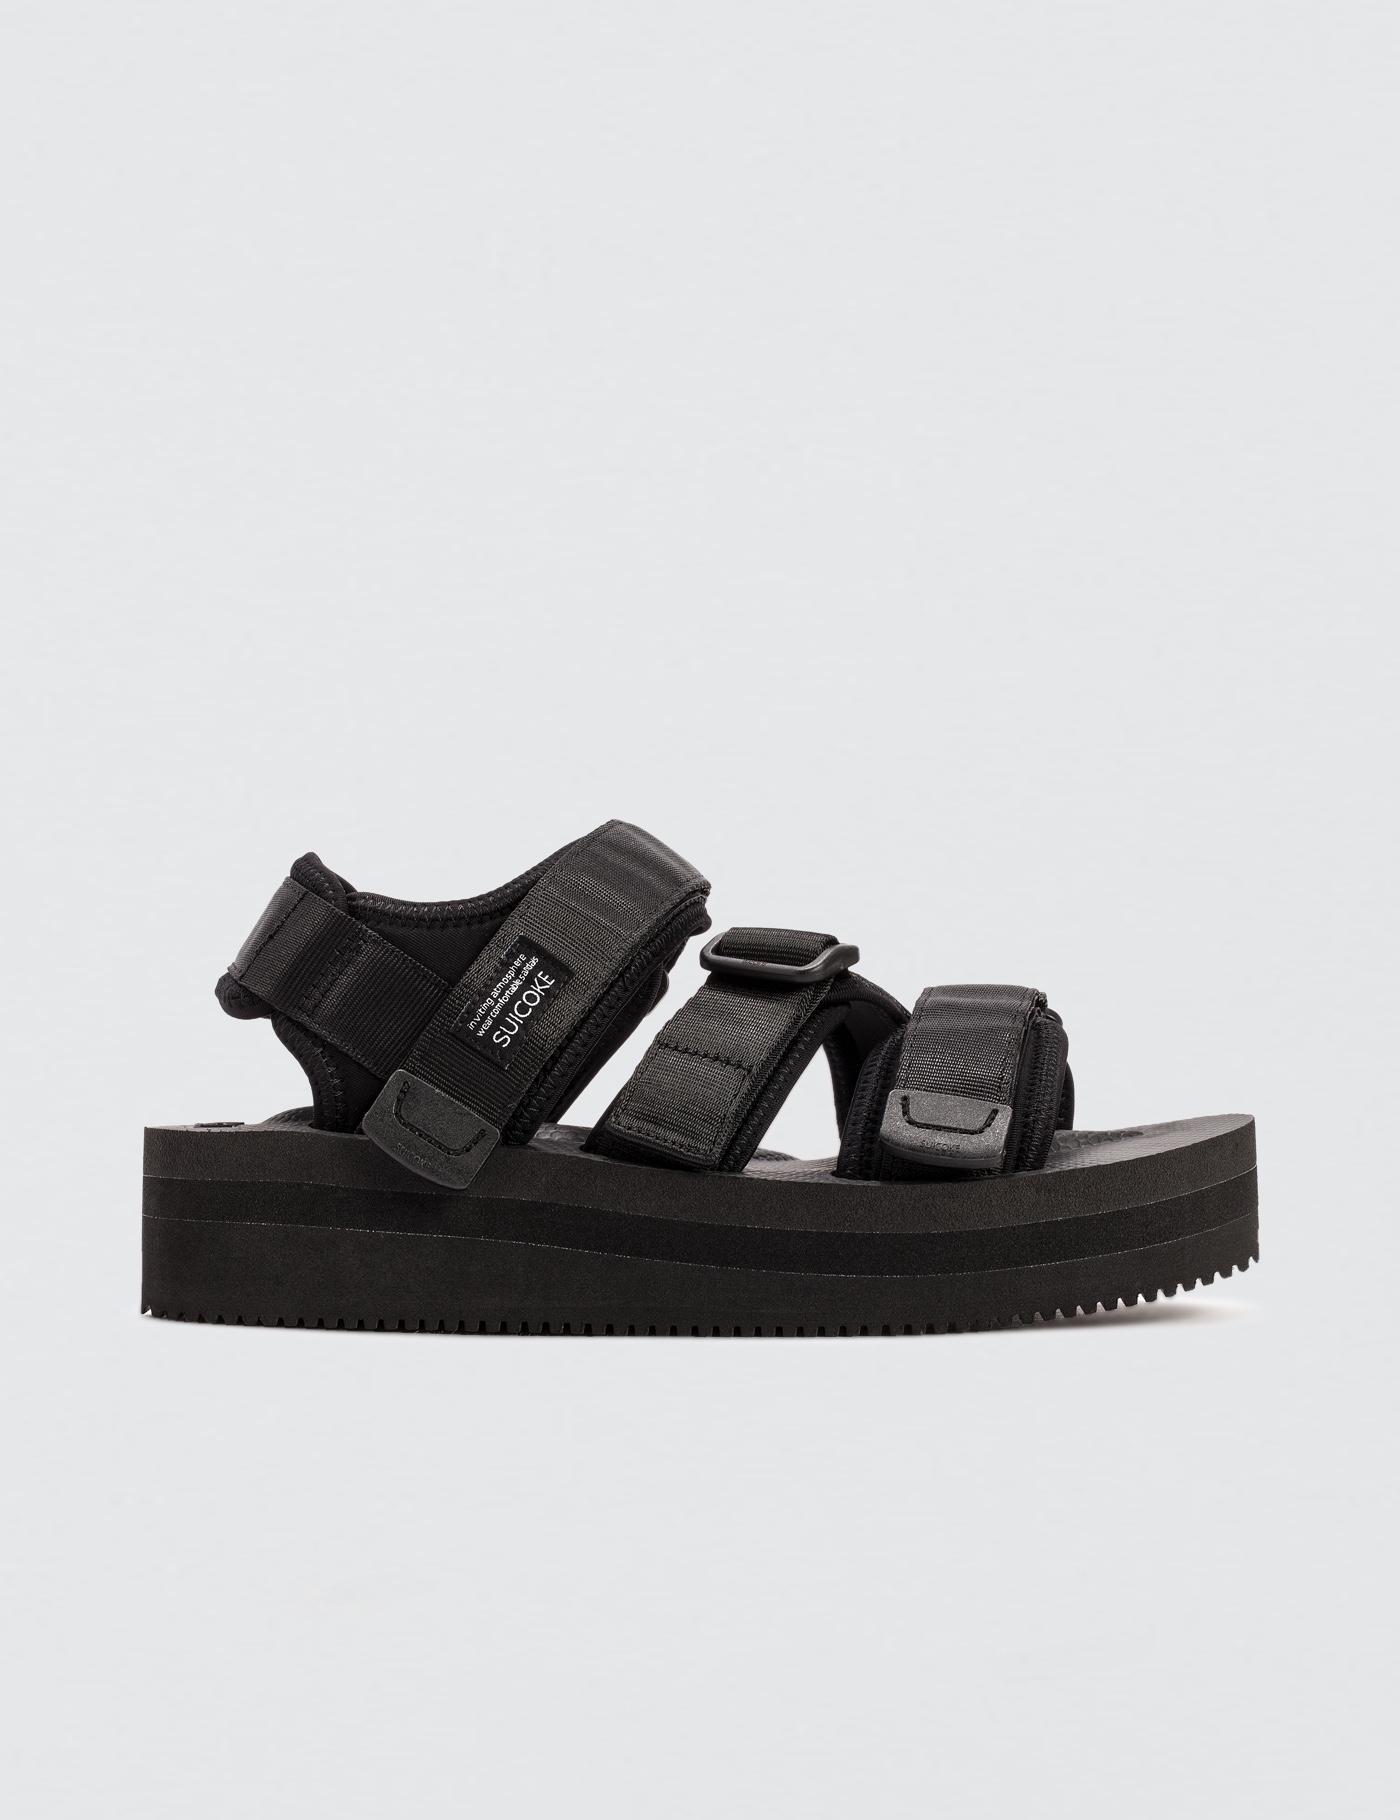 992dc04b062 Suicoke Black Kisee-vpo Platform Sandals in Black - Lyst